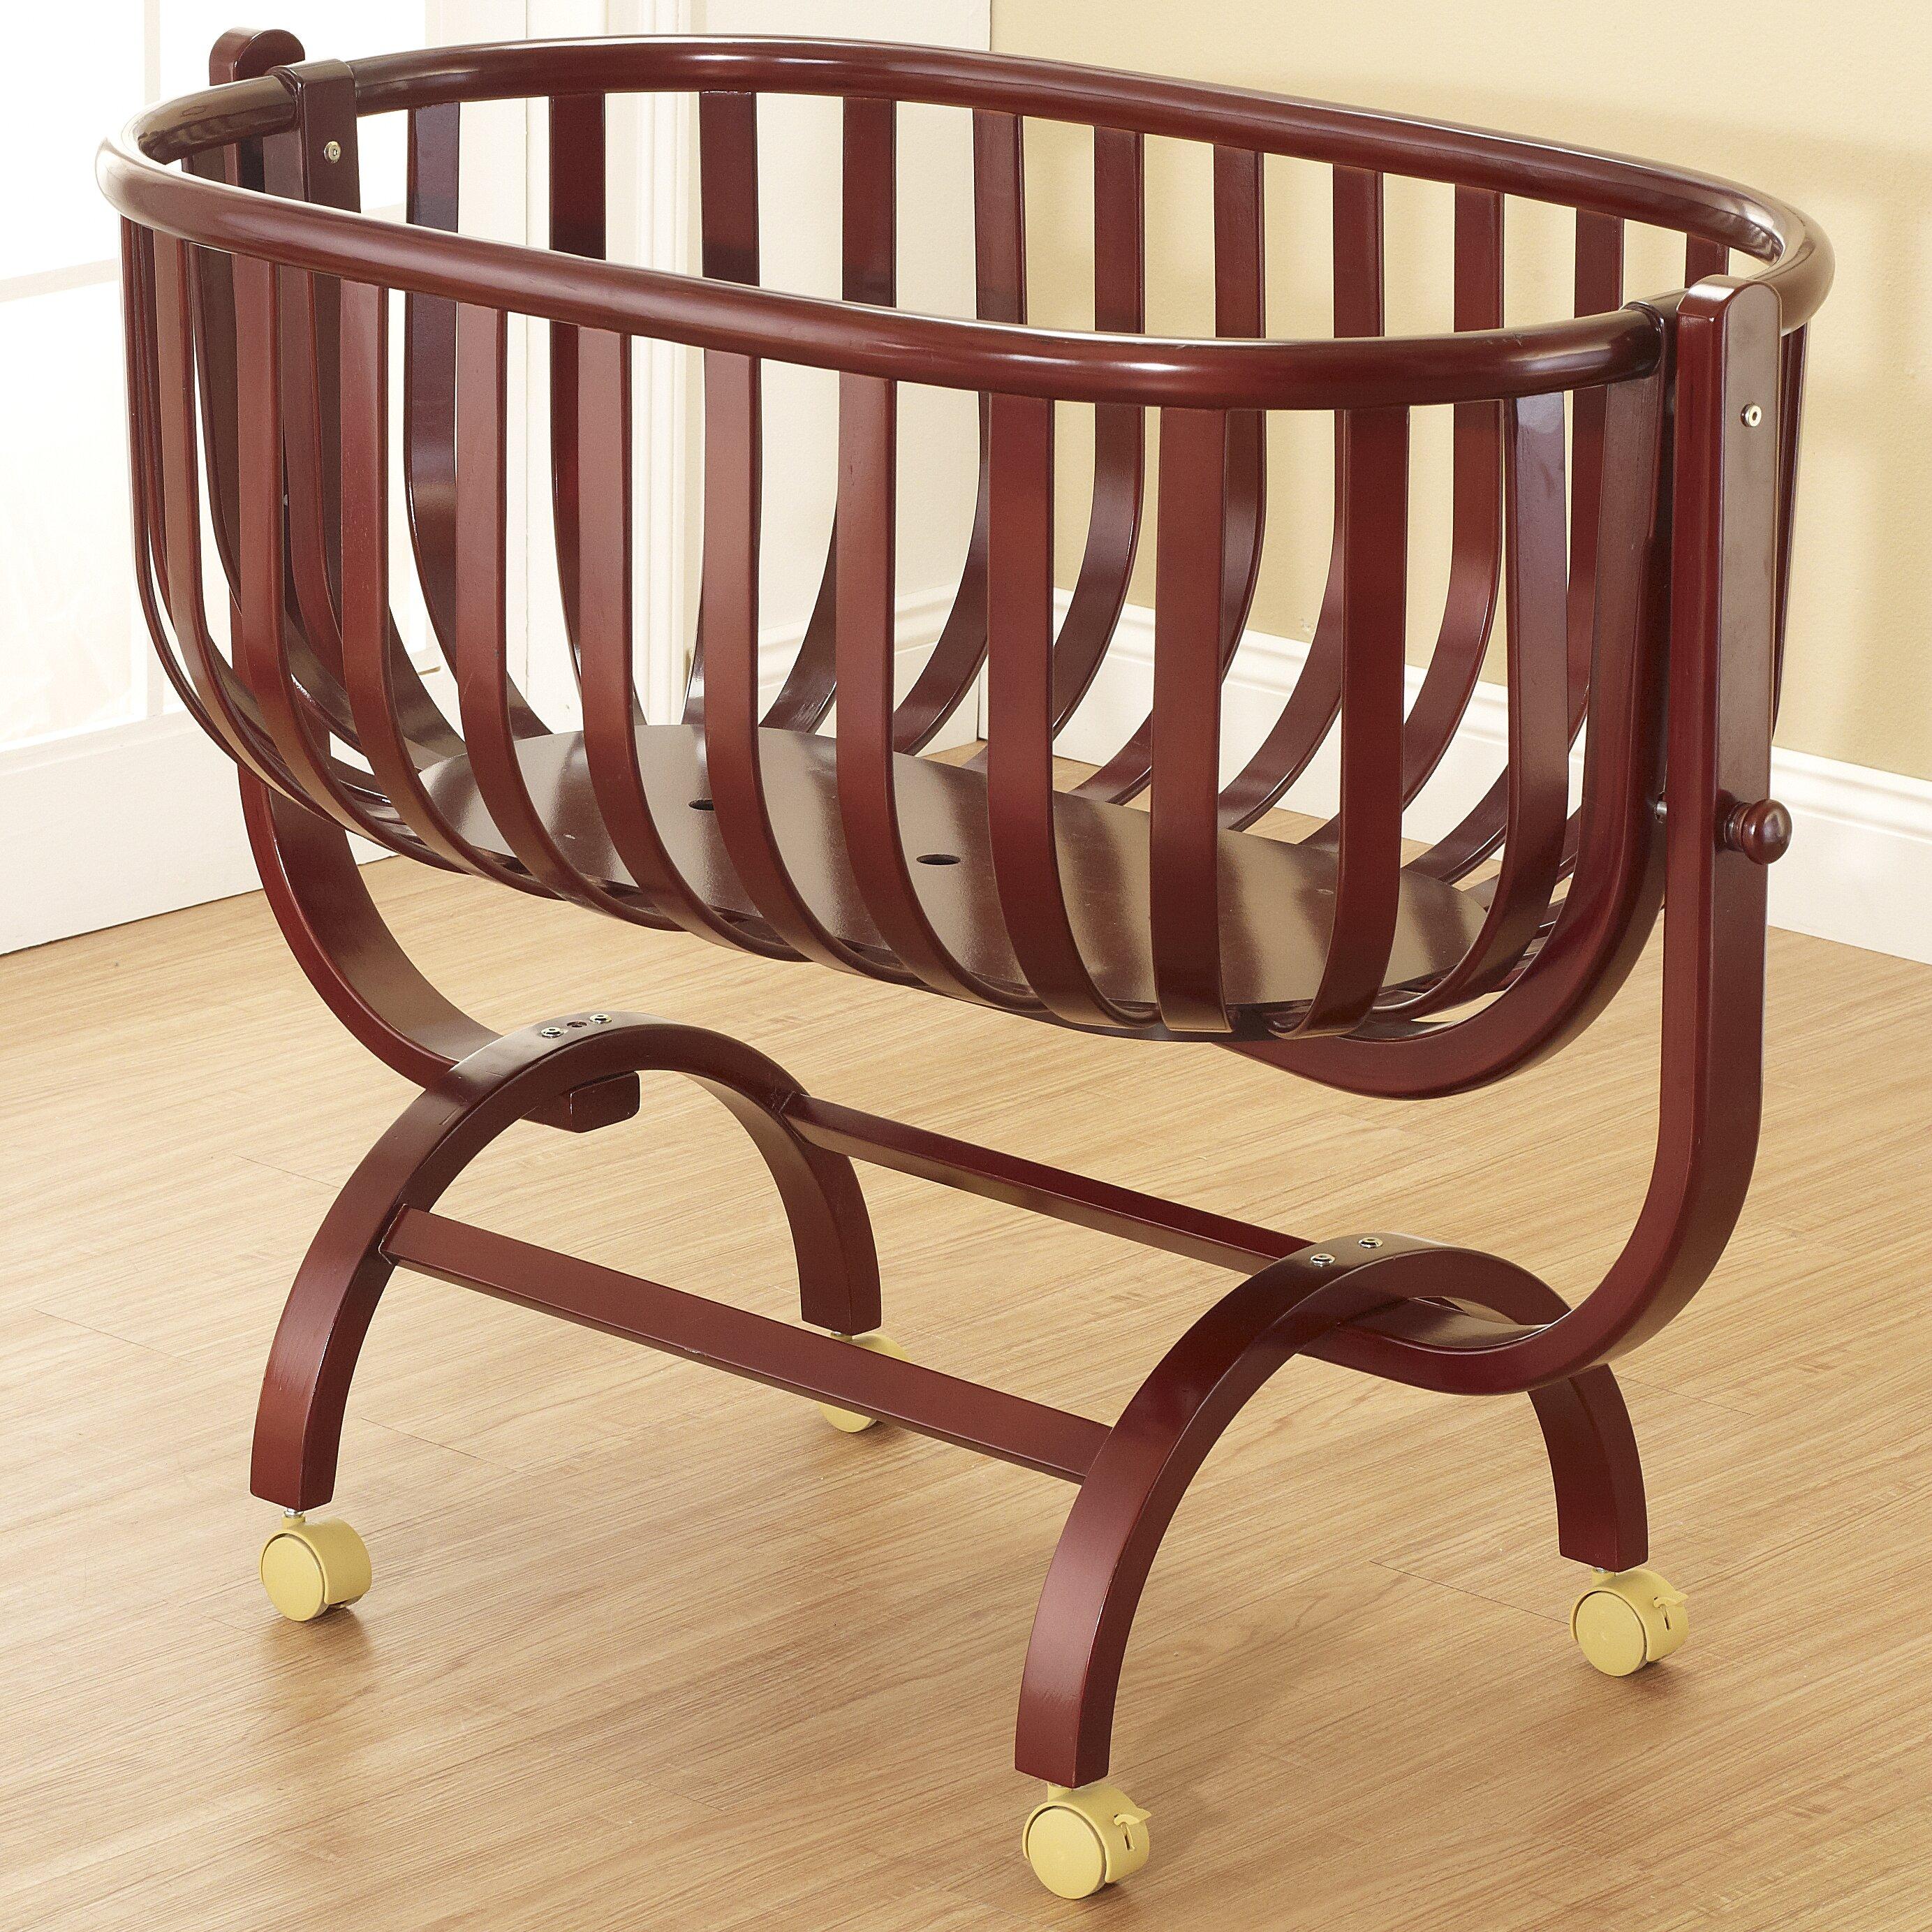 orbelle gabriella cradle reviews wayfair. Black Bedroom Furniture Sets. Home Design Ideas